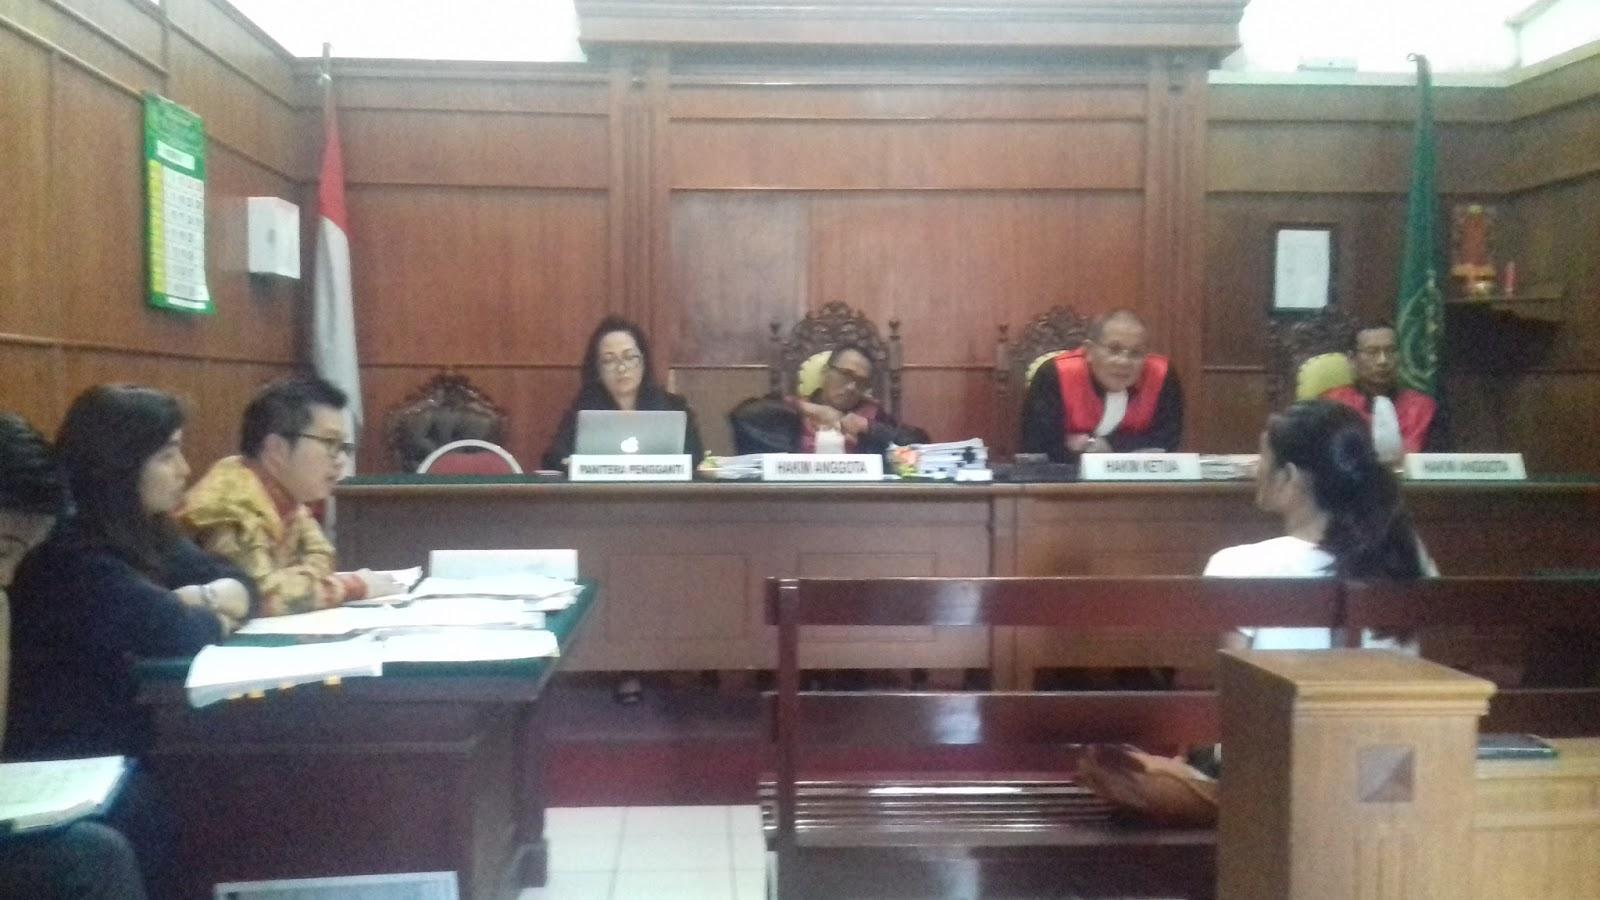 Sidang Lanjutan Perdata Empire Tiga Saksi Rontokkan Tudingan  # Muebles Coarte Manta